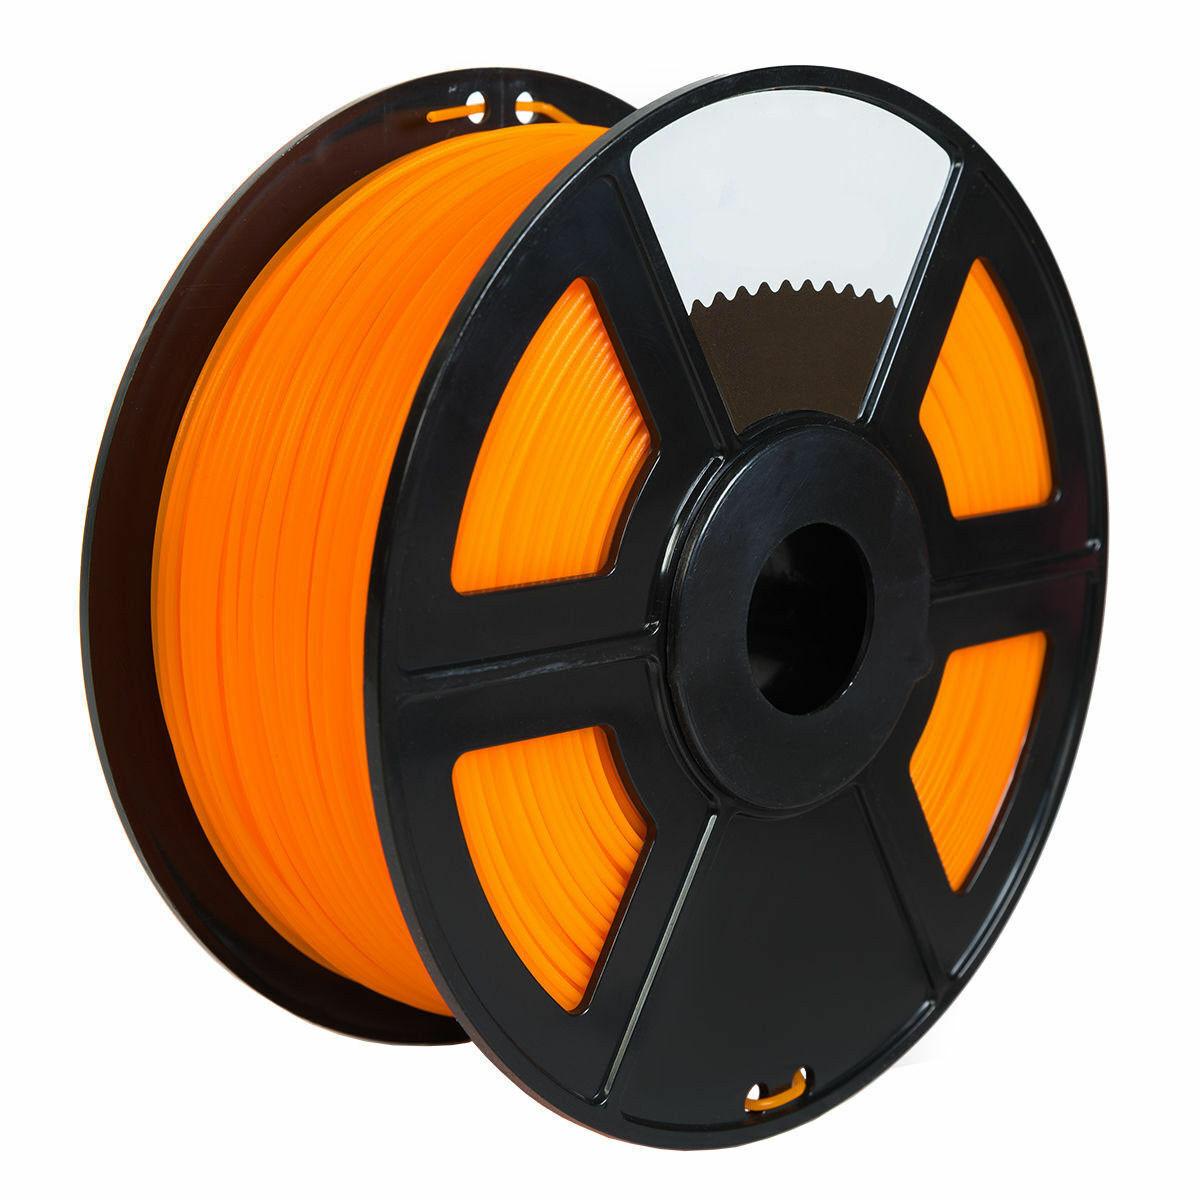 3D Printer Premium PETG Filament 1.75mm 1kg/2.2lb - Orange